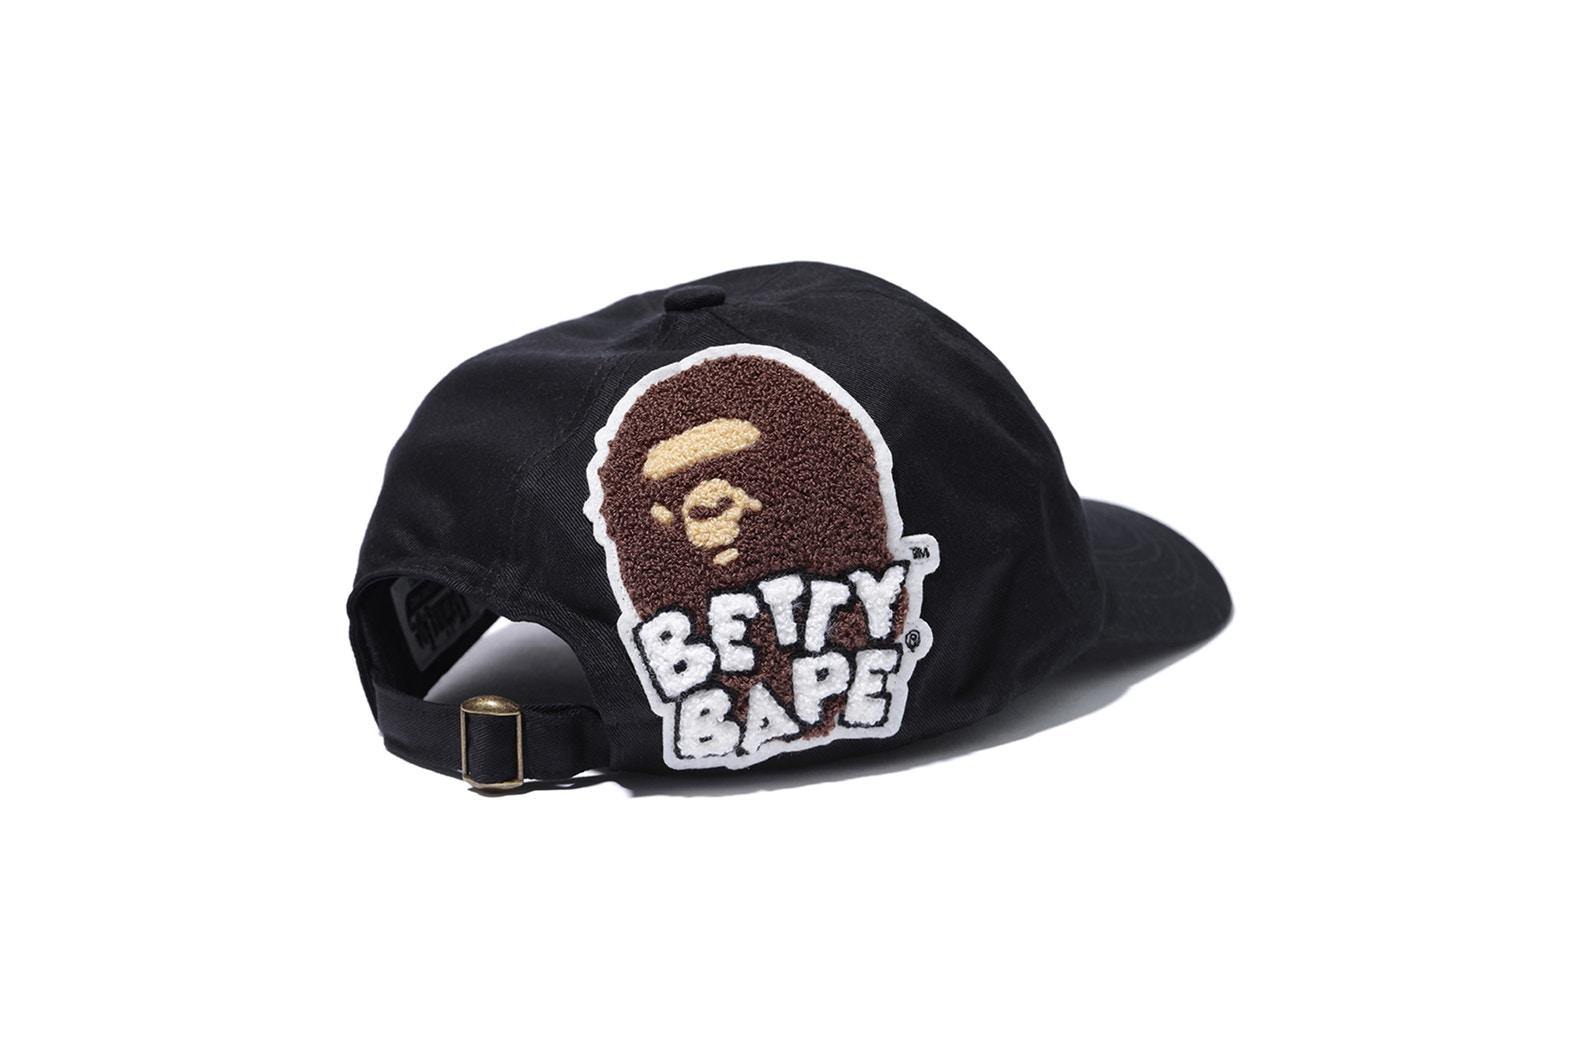 http-bae-hypebeast-comfiles201710betty-boop-bape-collection-01